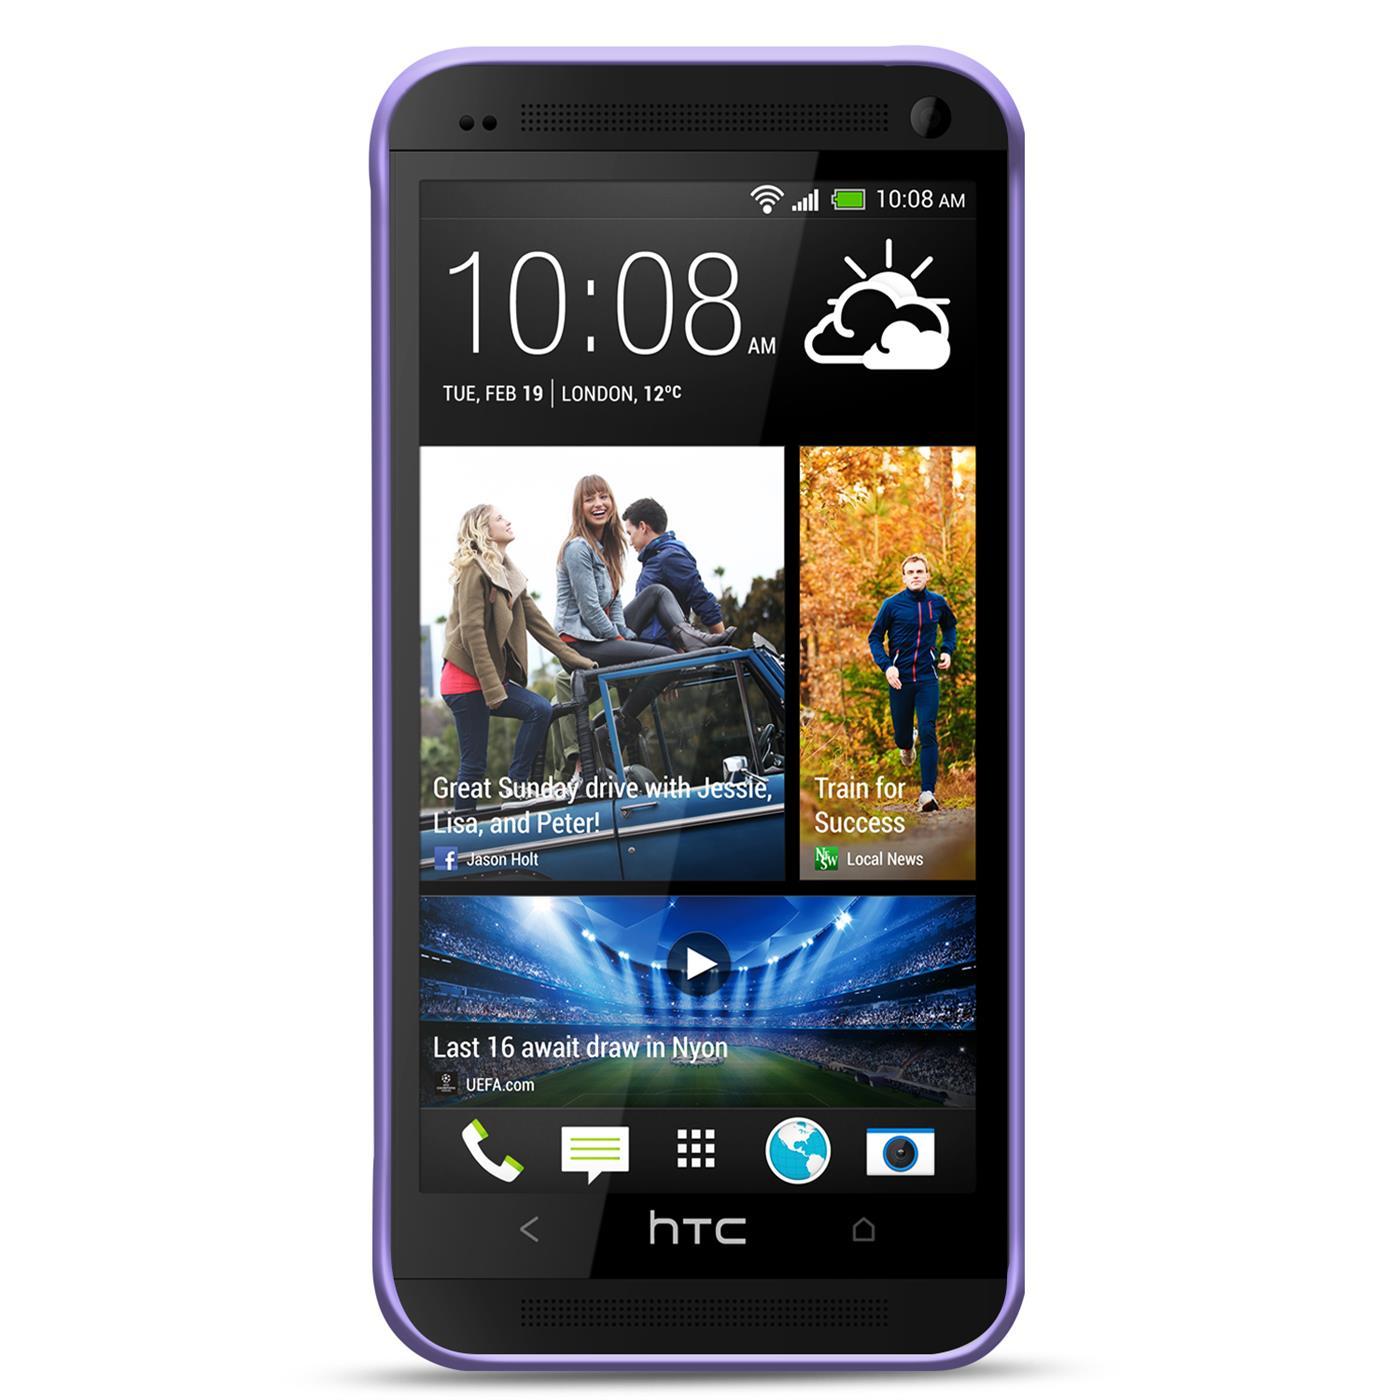 HTC-One-m9-Silikon-Gel-S-Line-Case-Cover-Ultra-Thin-Slim-Back-Bumper Indexbild 13